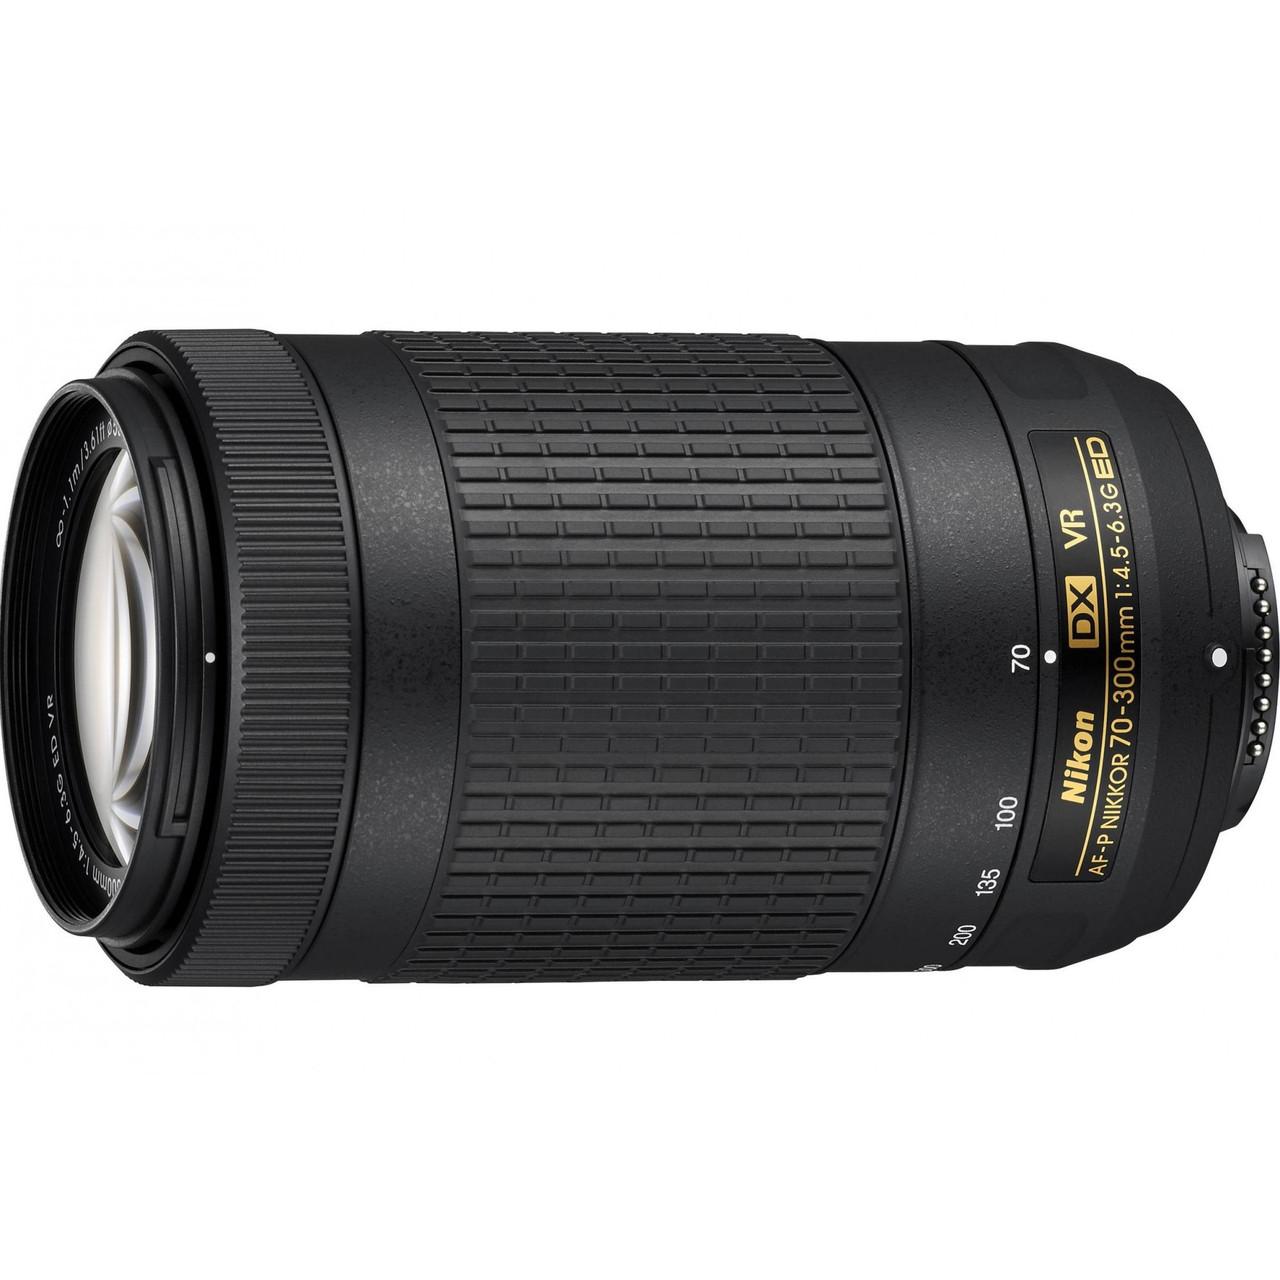 Nikon AF-P DX 70-300mm f/4.5-6.3 G ED VR ( на складі )